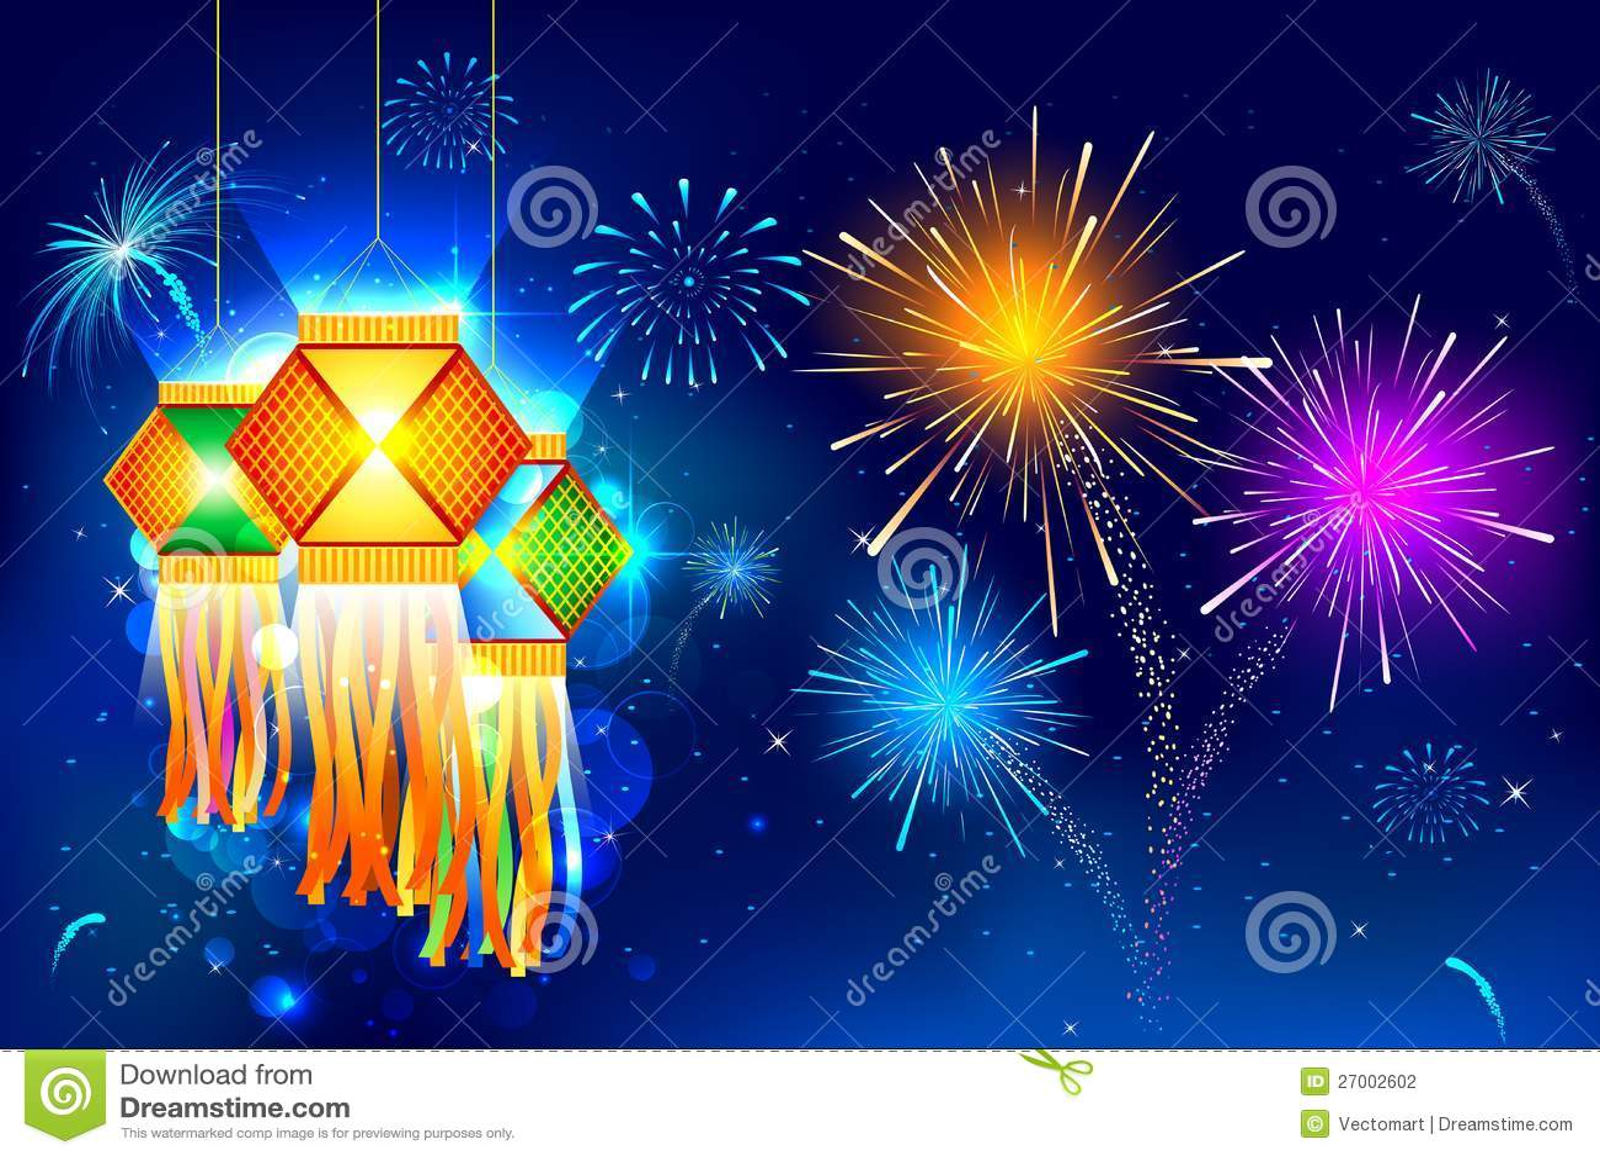 Indian Culture Wallpaper Hd Diwali Hanging Lantern Stock Photography Image 27002602